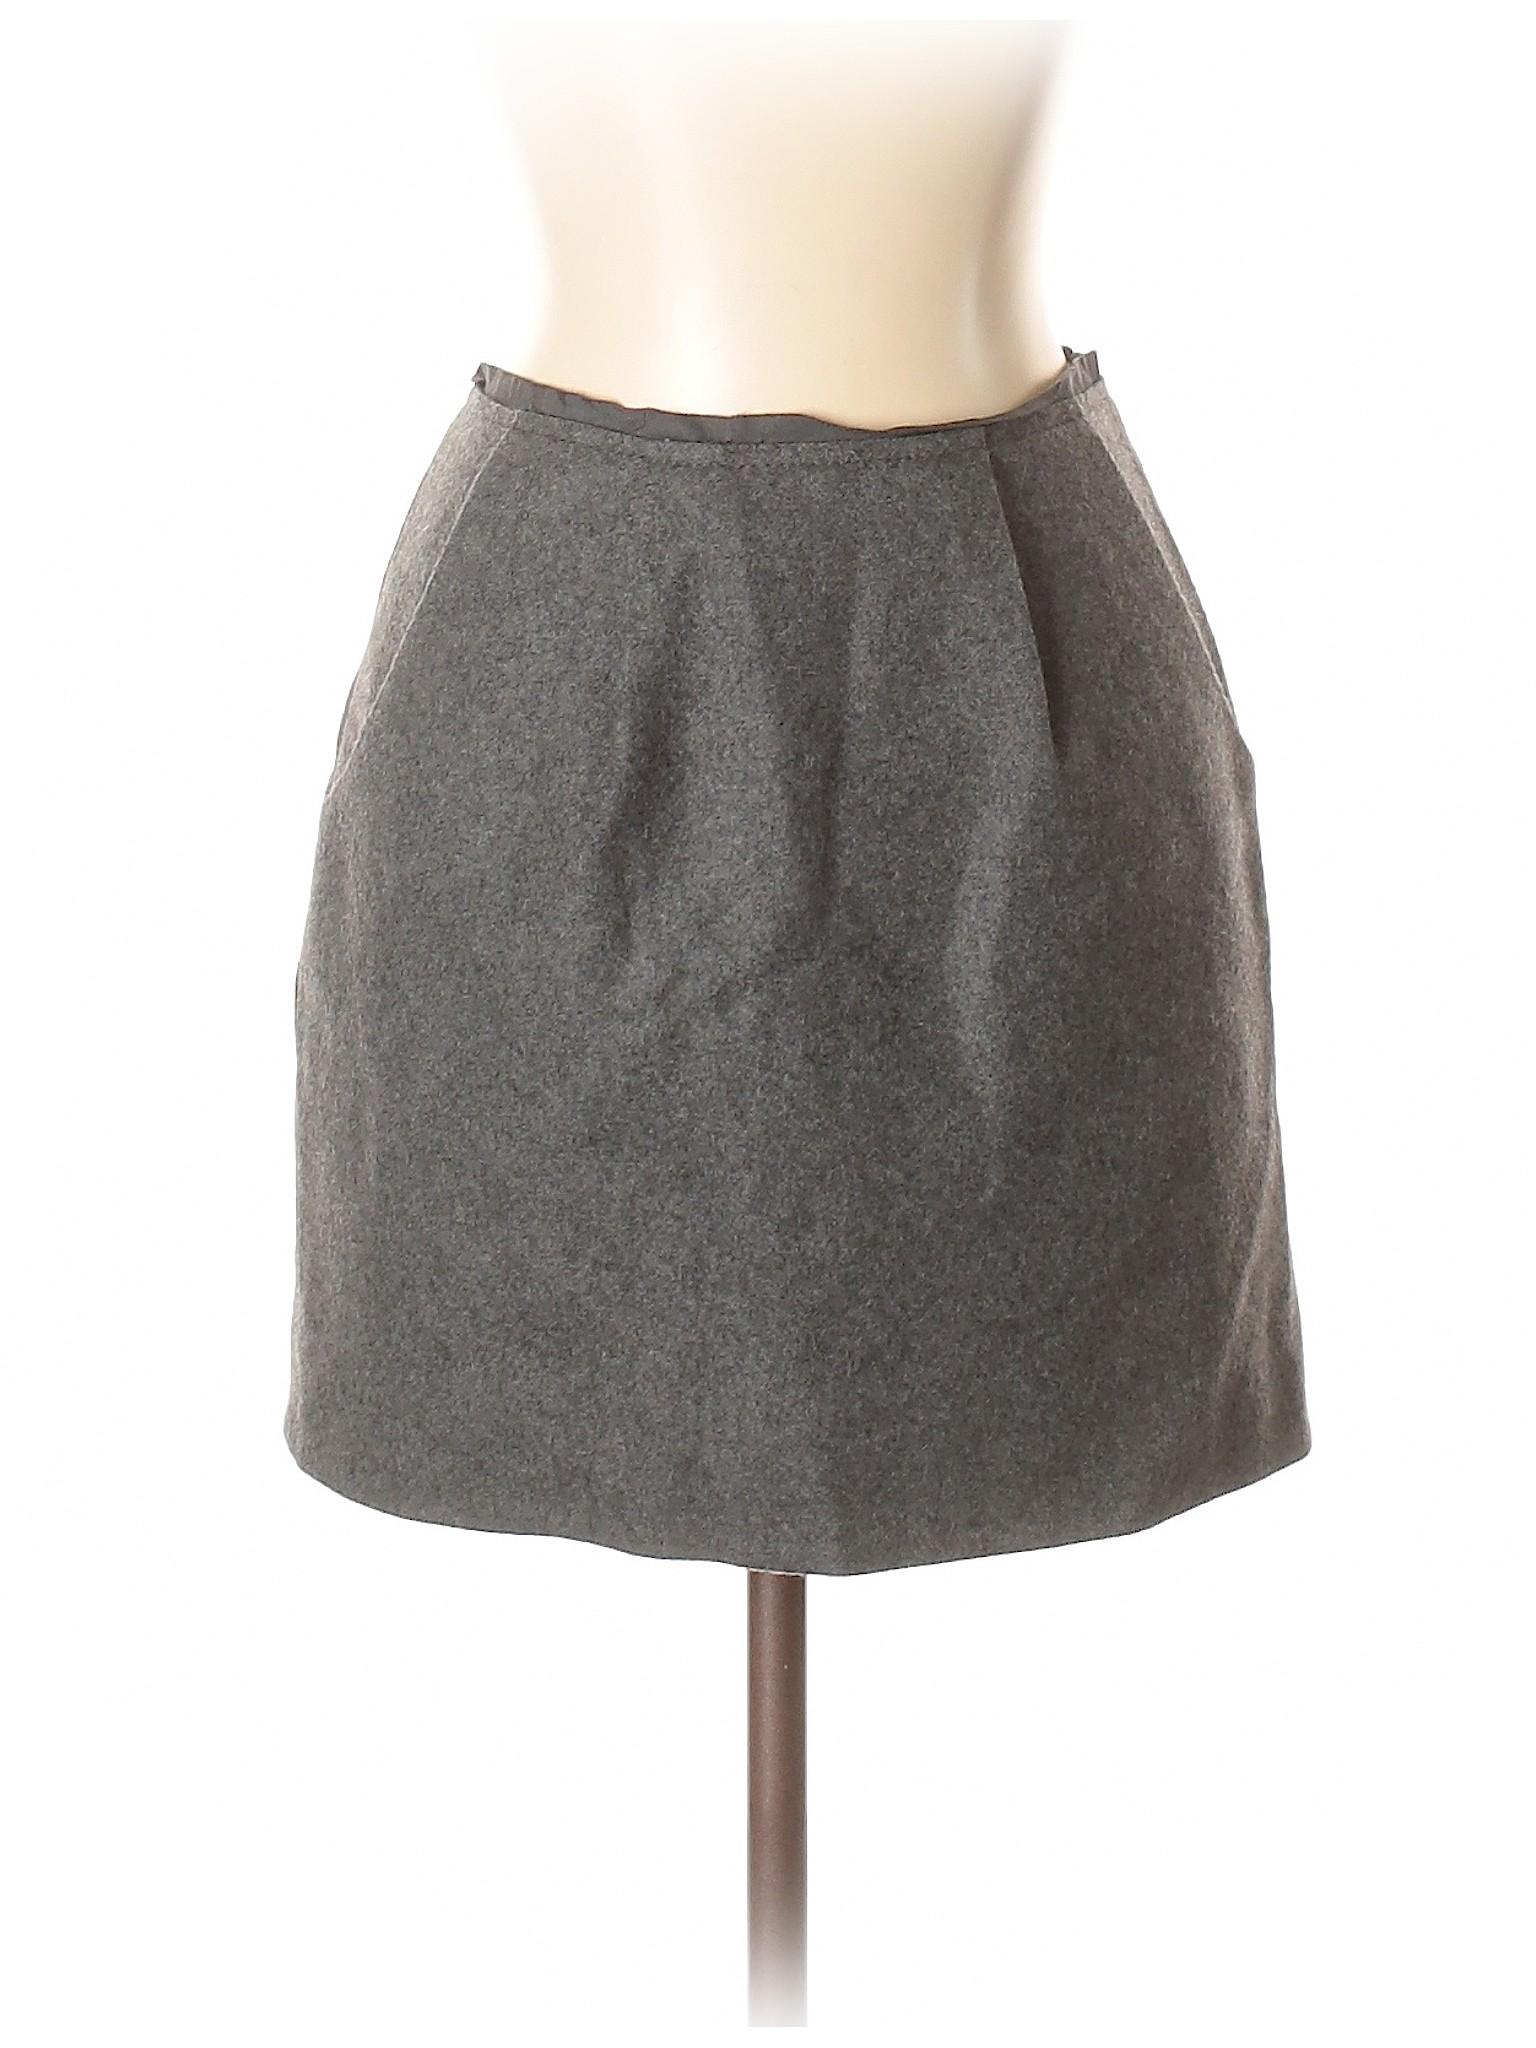 Wool J leisure Skirt Crew Boutique qUTSxAw